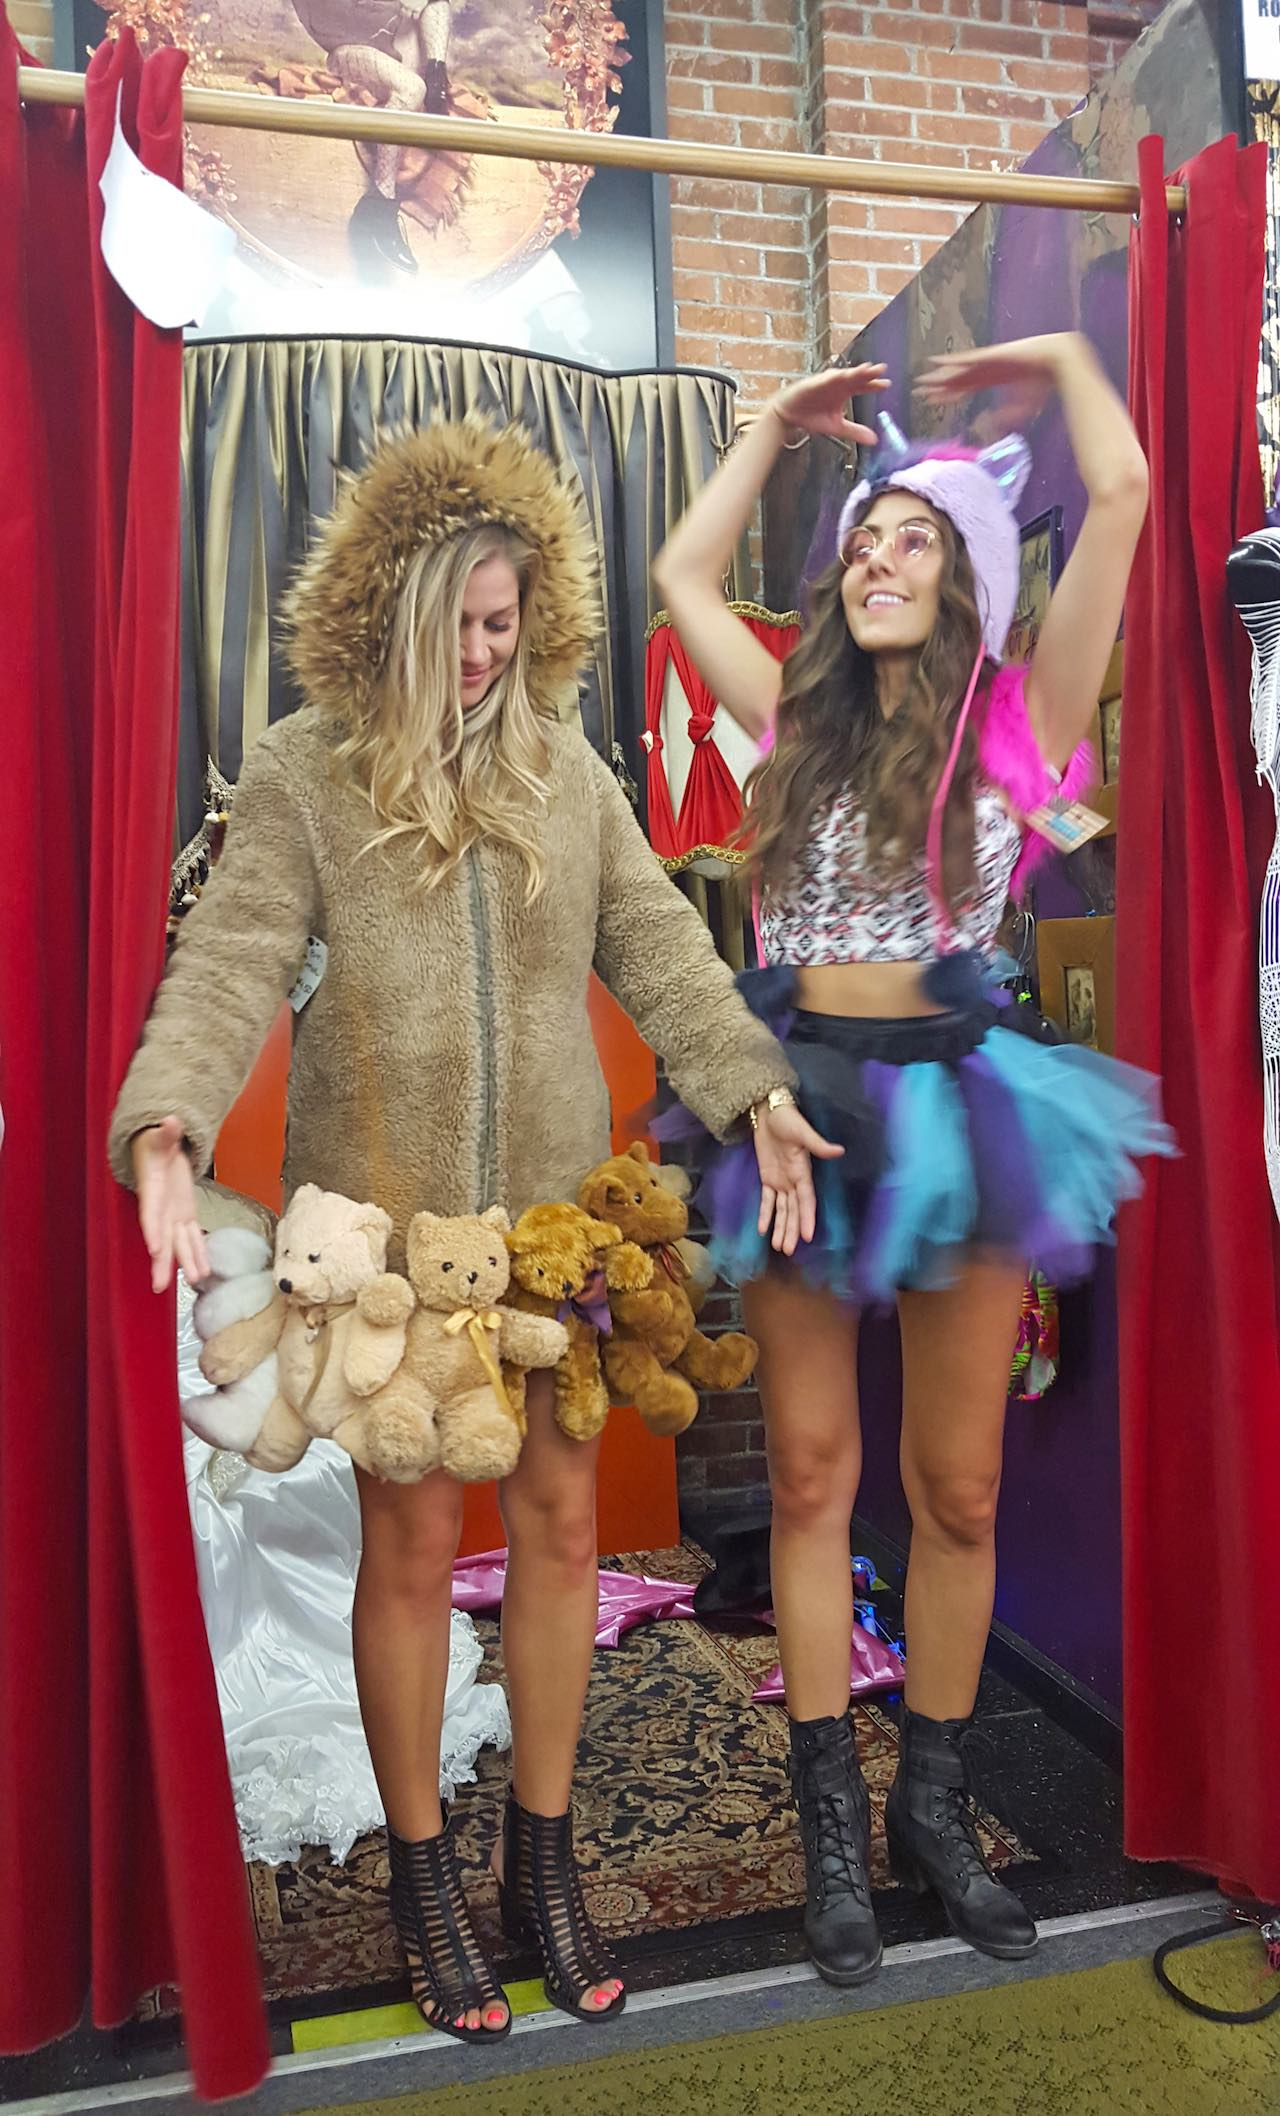 Reno girls dresses